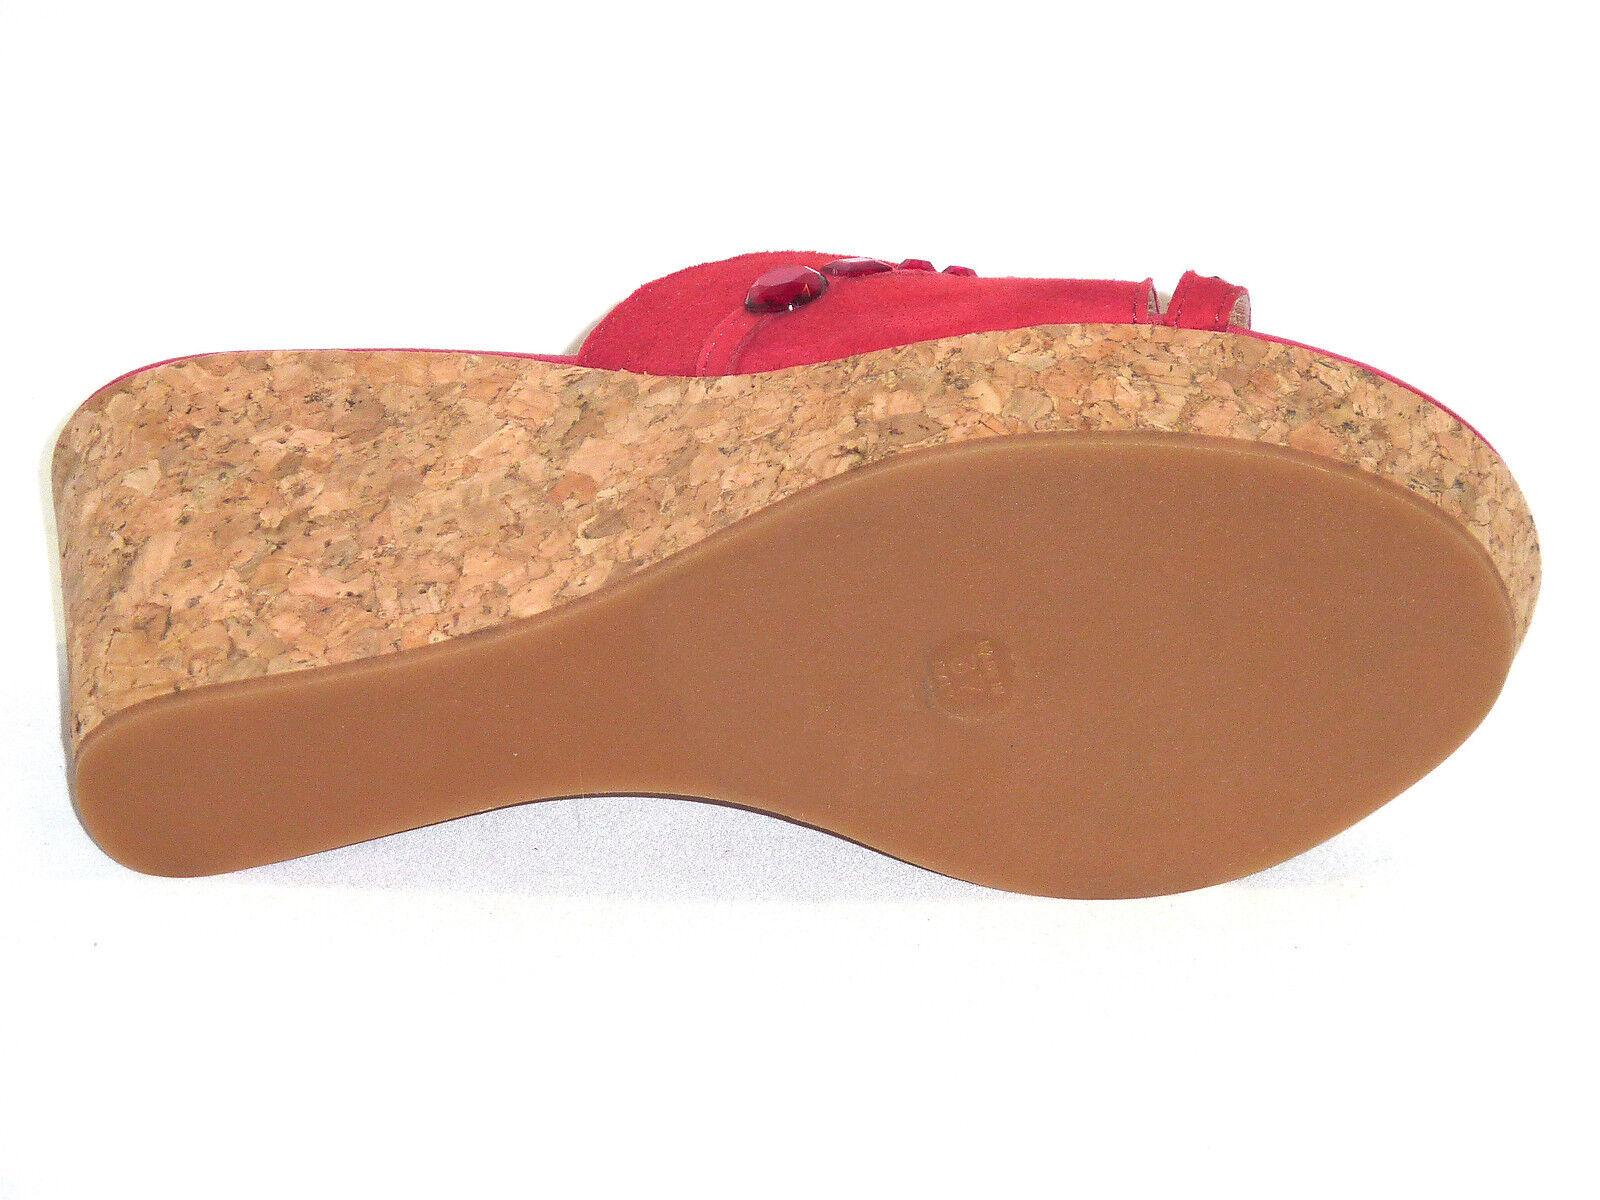 833 ZEPPE SANDALI DONNA FONDO SUGHERO PELLE in NABUK ROSSO Made in PELLE Italy n. 39 787739